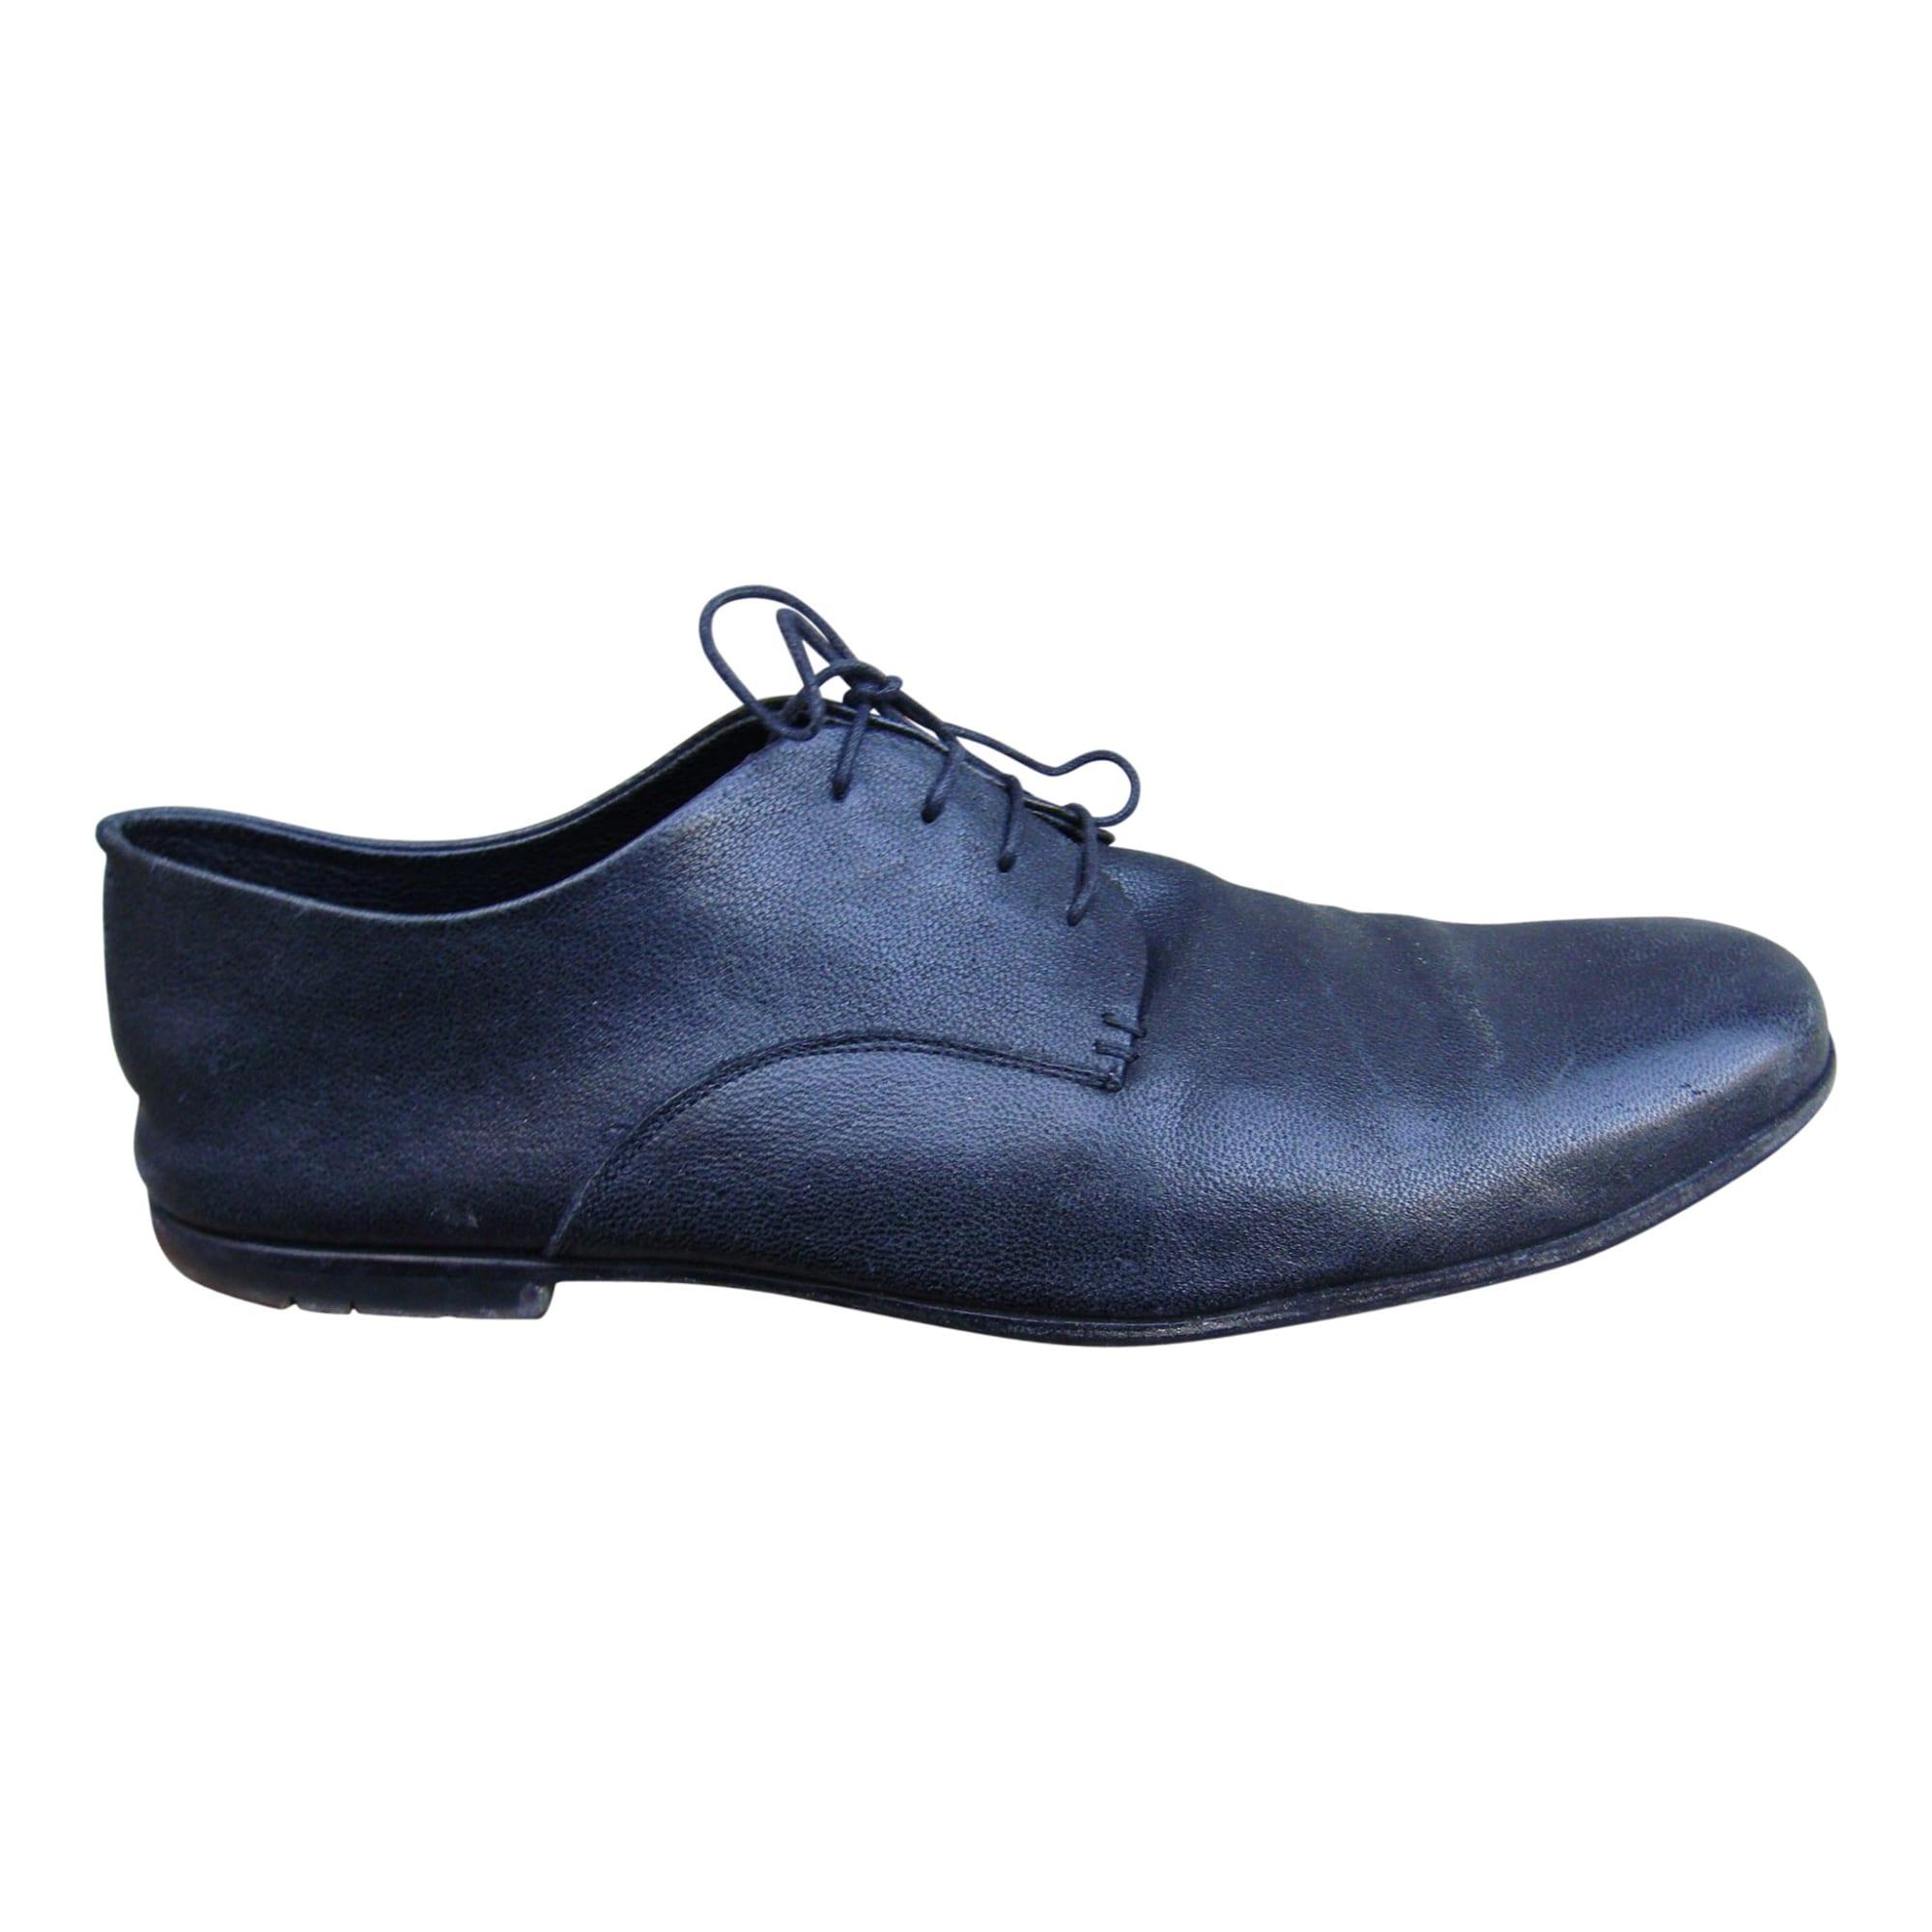 Chaussures à lacets HESCHUNG Noir